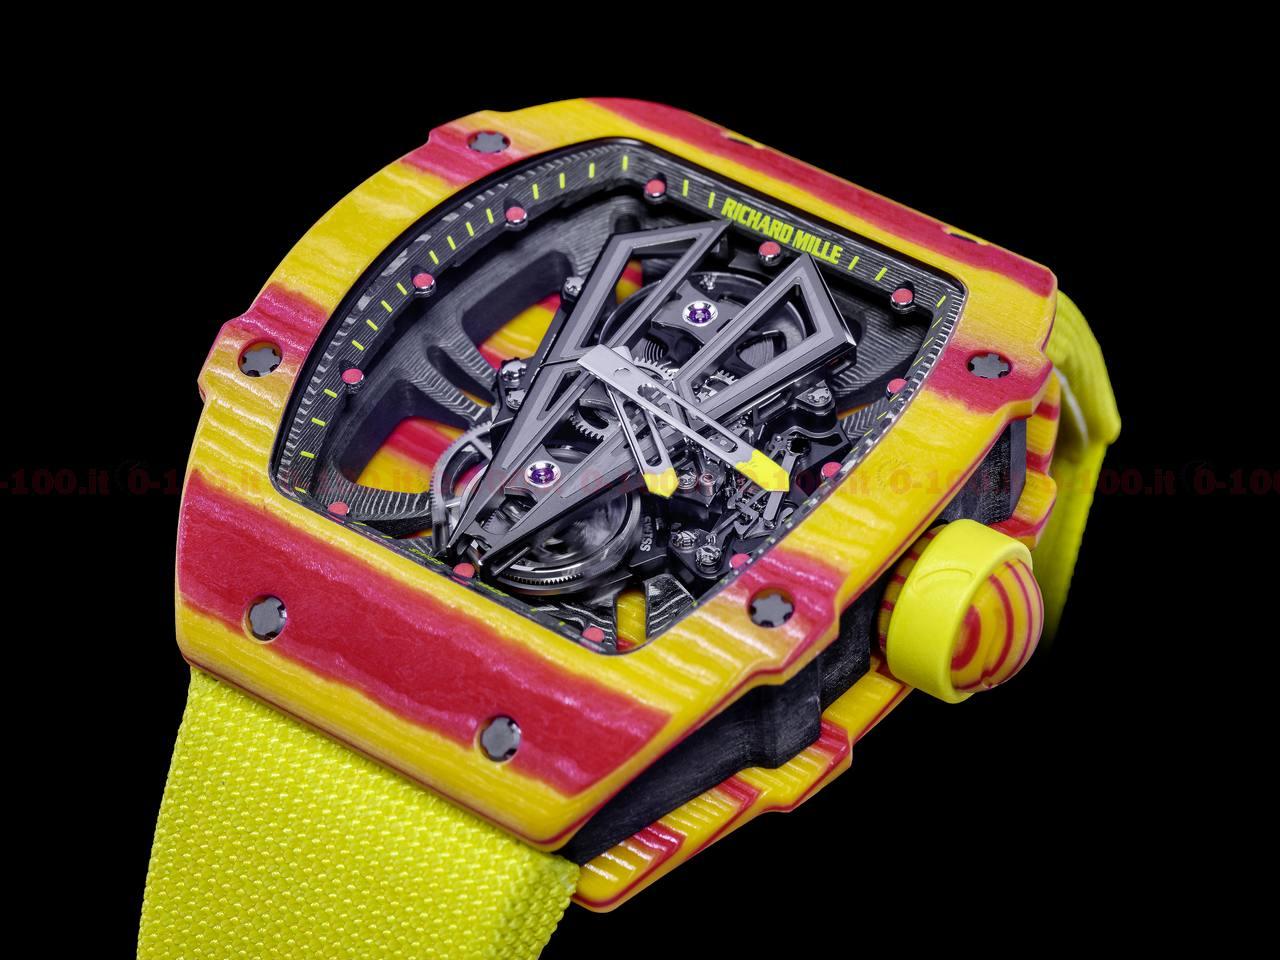 Richard Mille RM 27-03 Limited Edition_prezzo_price_0-1003